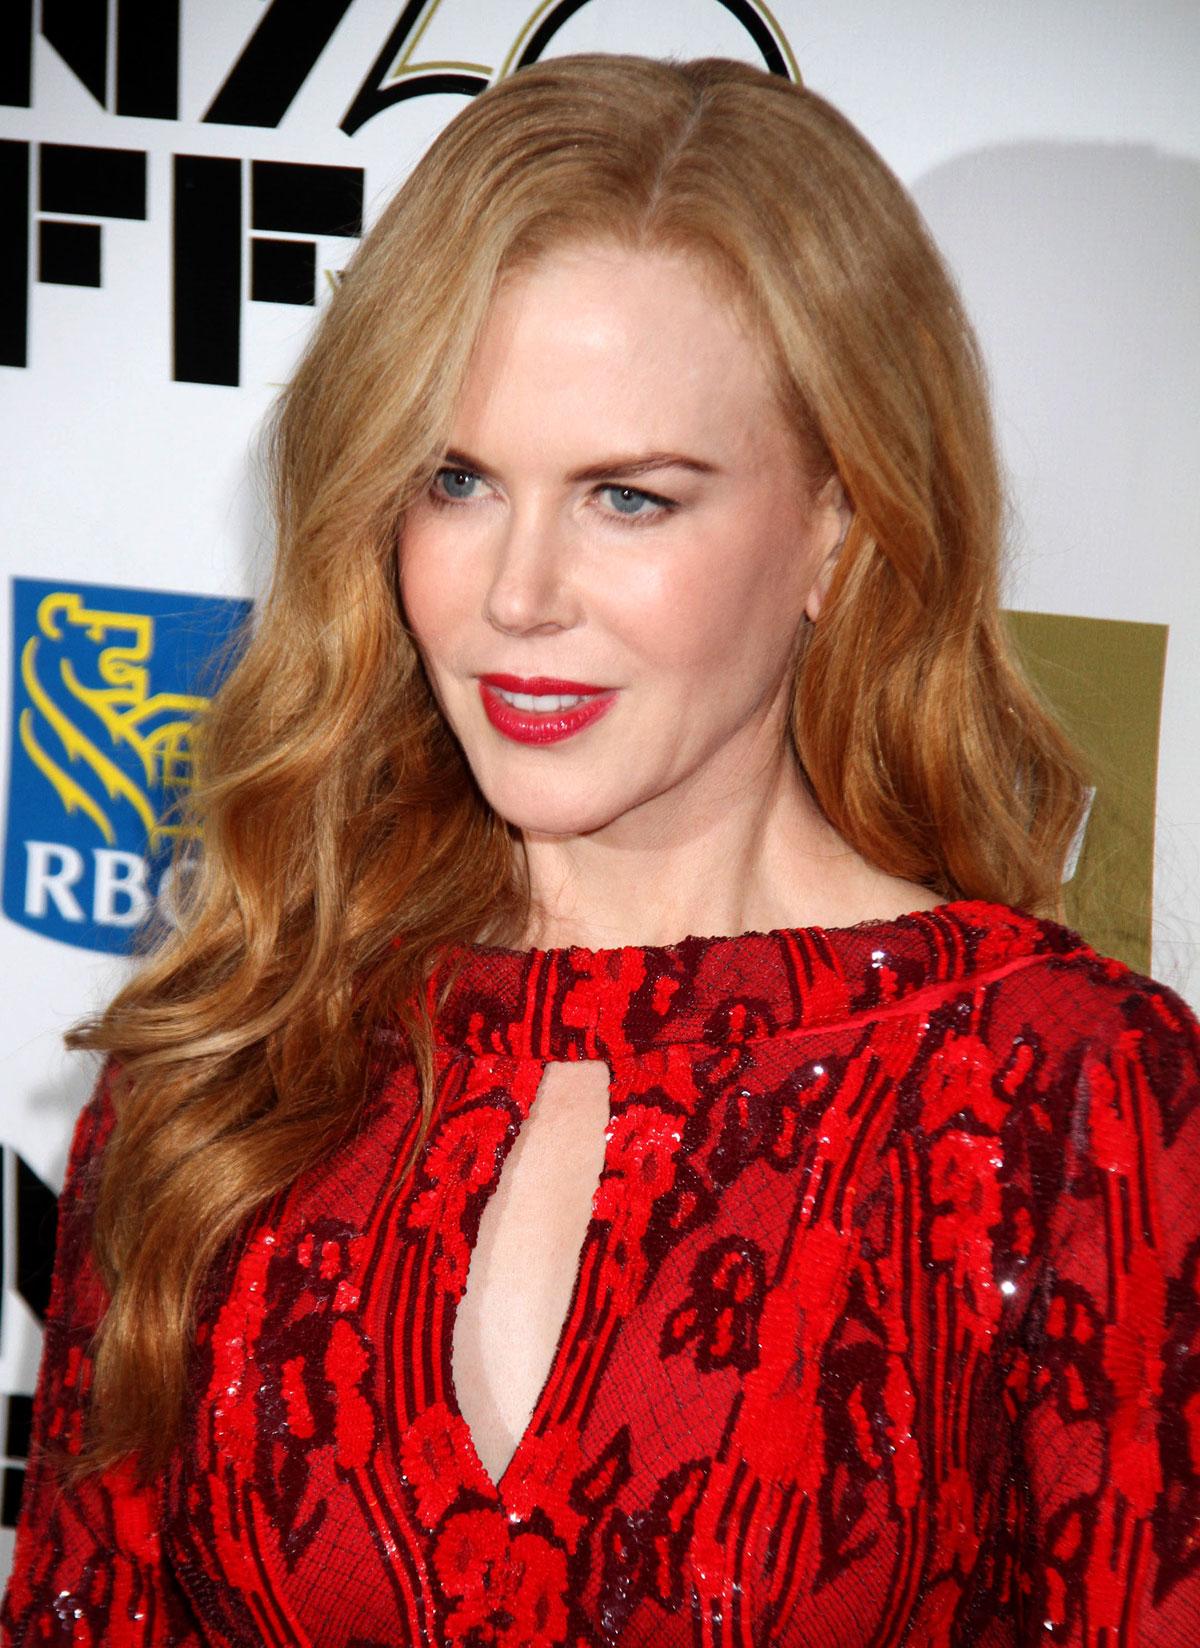 NICOLE-KIDMAN-at-Nicole-Kidman-Gala-Tribute-at-the-50th-Annual-New-York-Film-Festival-3.jpg